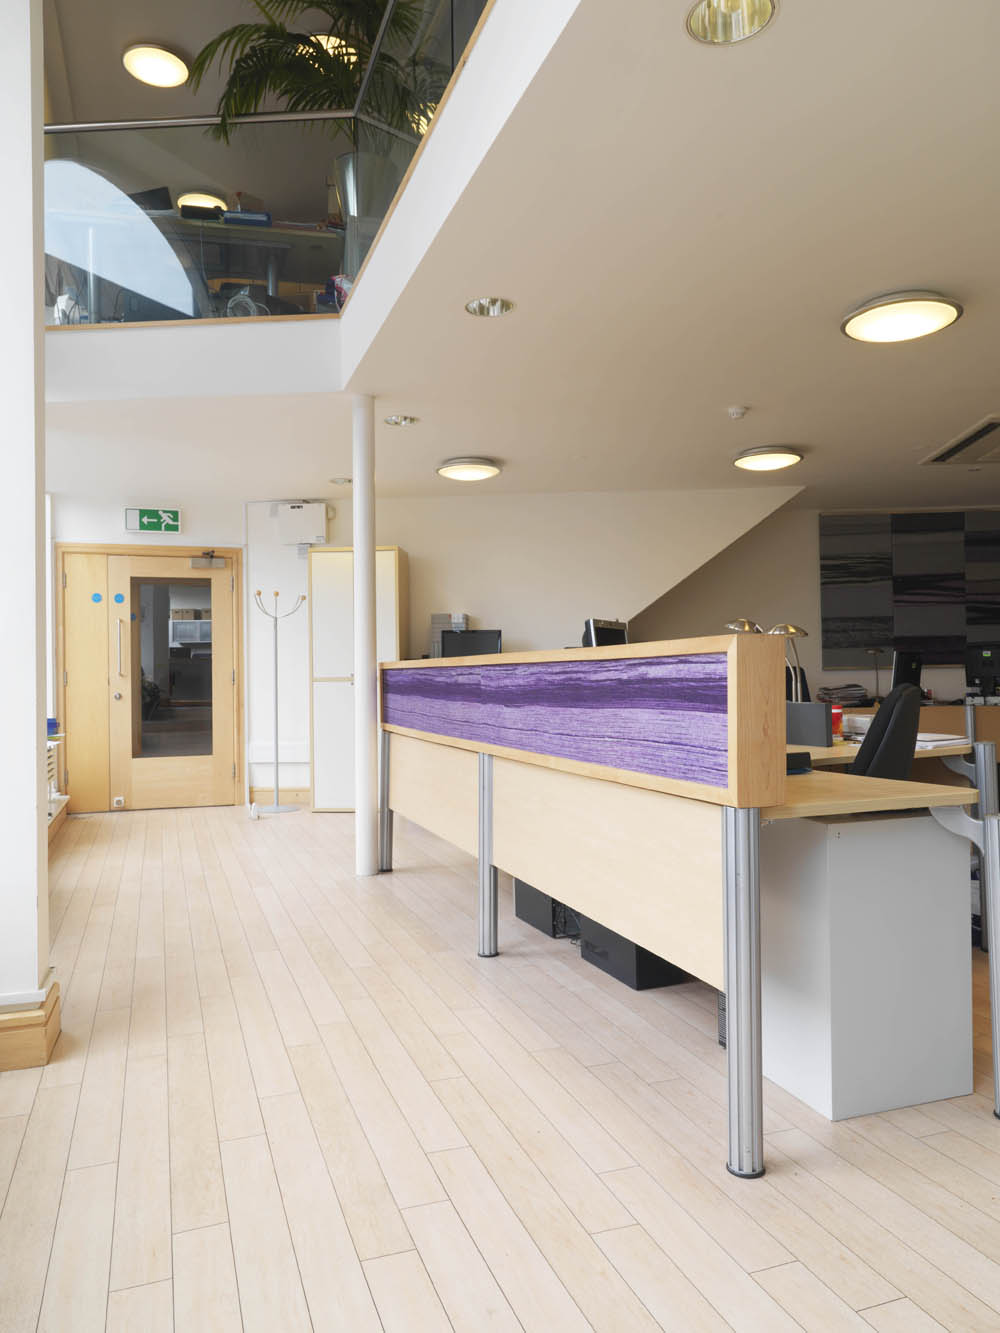 Films @ 59 Desk Panel Gill Hewitt Studios Strata Acoustic Textile